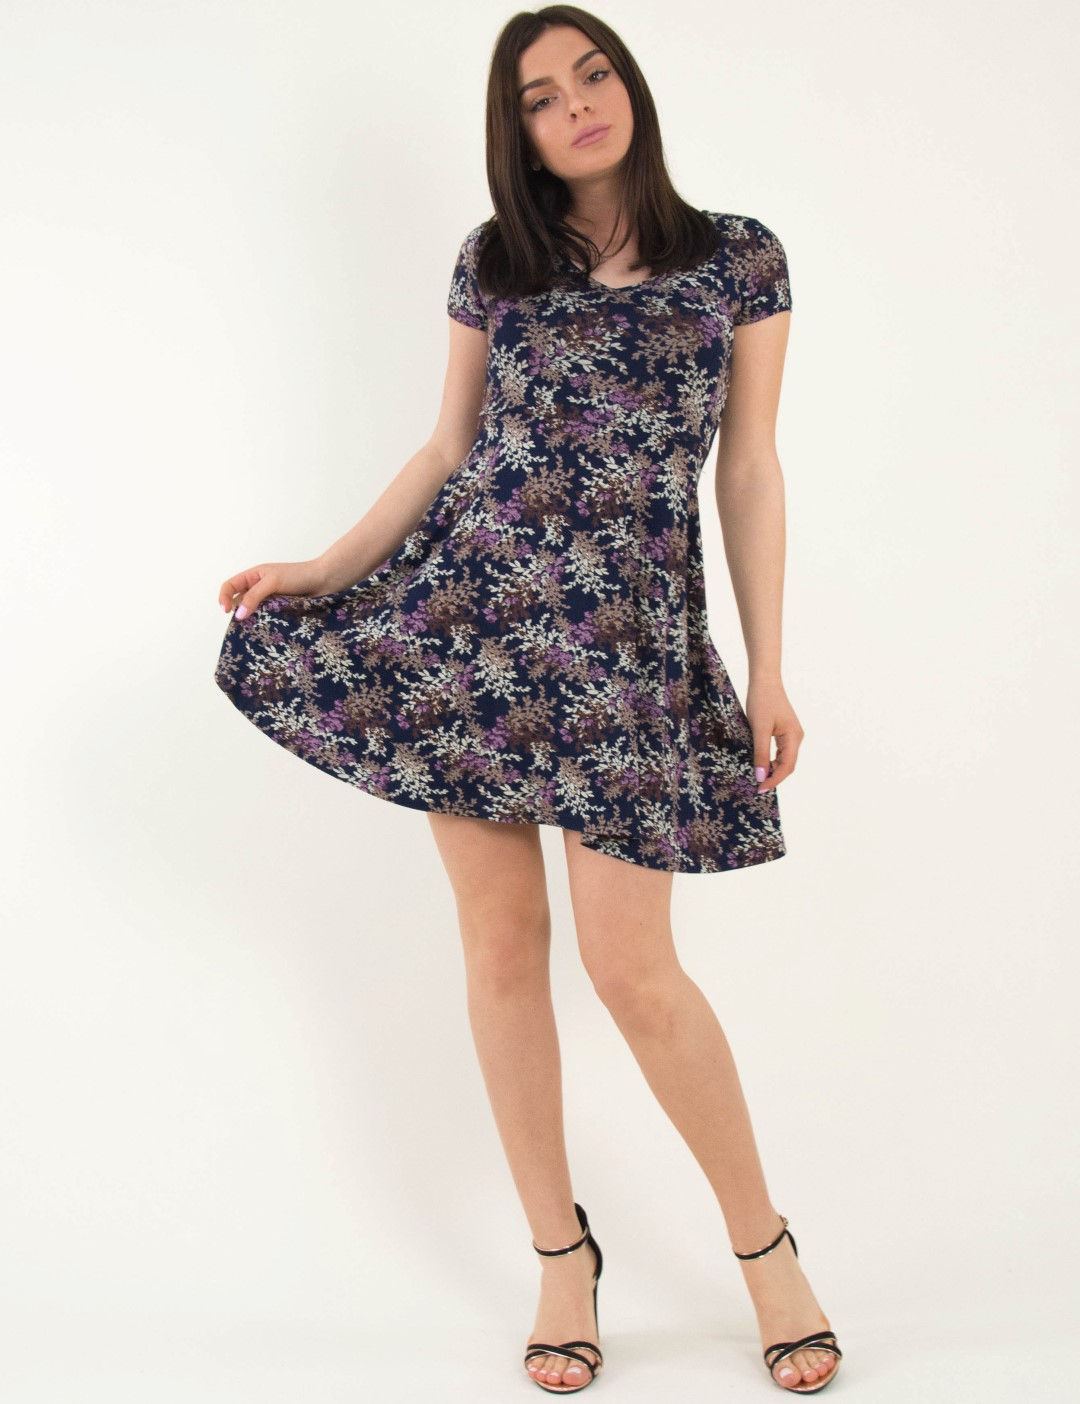 00a1eaa3d9d4 Γυναικείο μωβ φόρεμα μίνι κλος φλοράλ Benisssimo 91004L